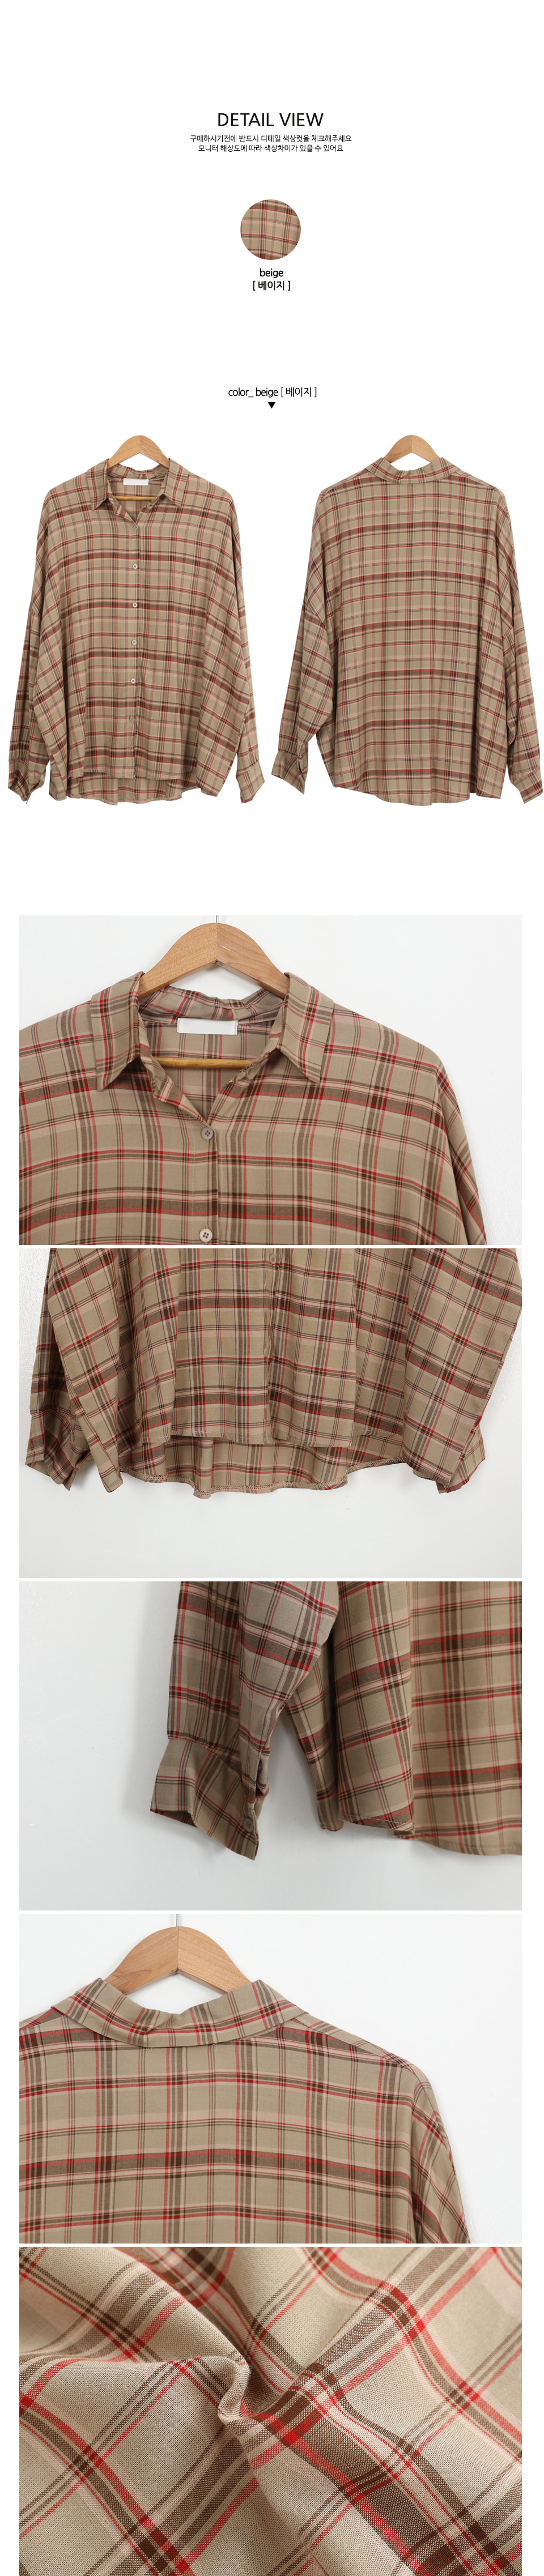 Honey Box Check Shirt